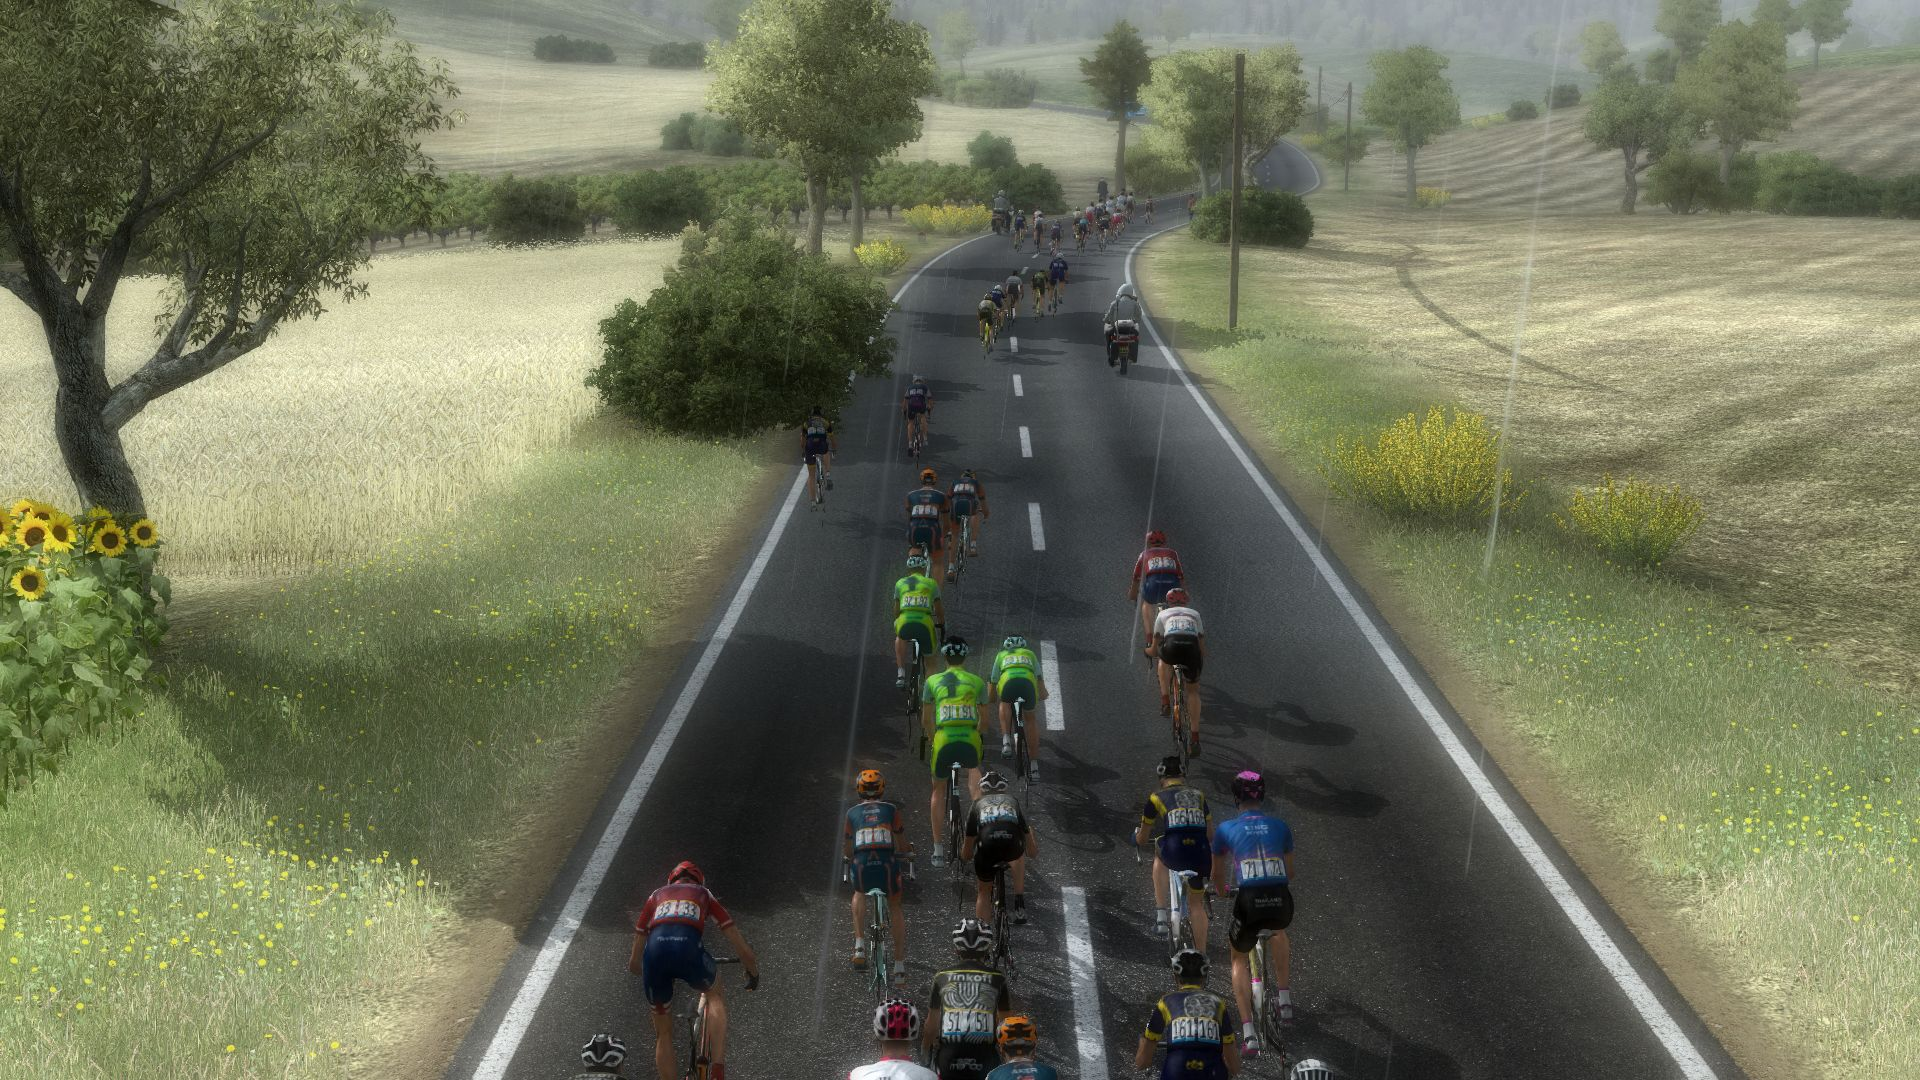 pcmdaily.com/images/mg/2020/Reports/GTM/Giro/S08/mg20_giro_s08_46.jpg